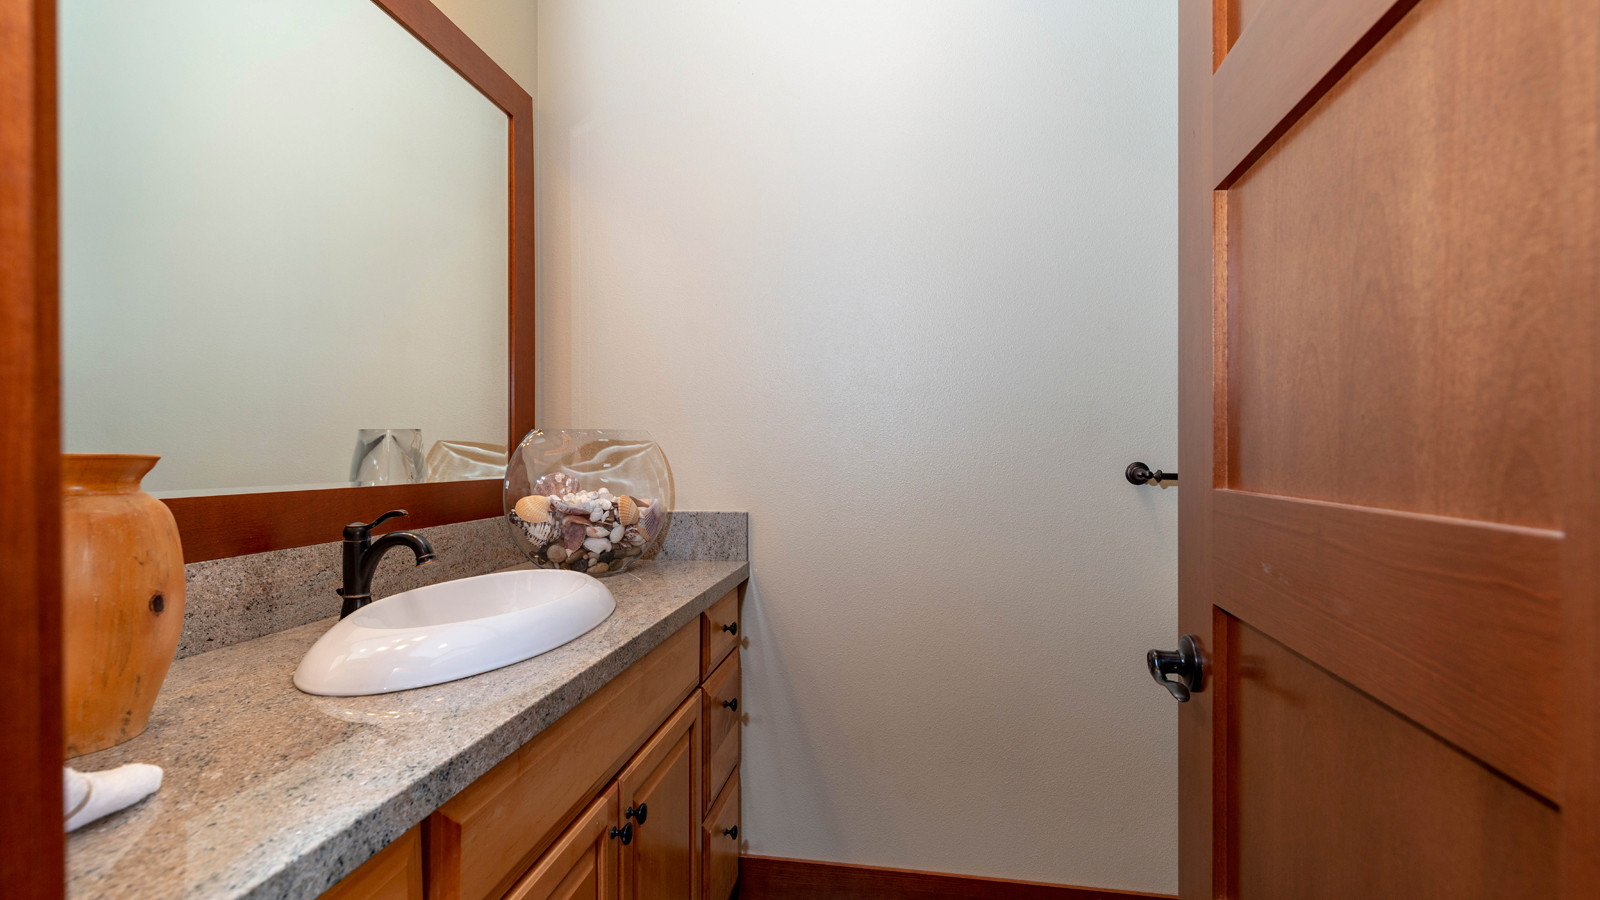 25-3rd bathroom.jpg